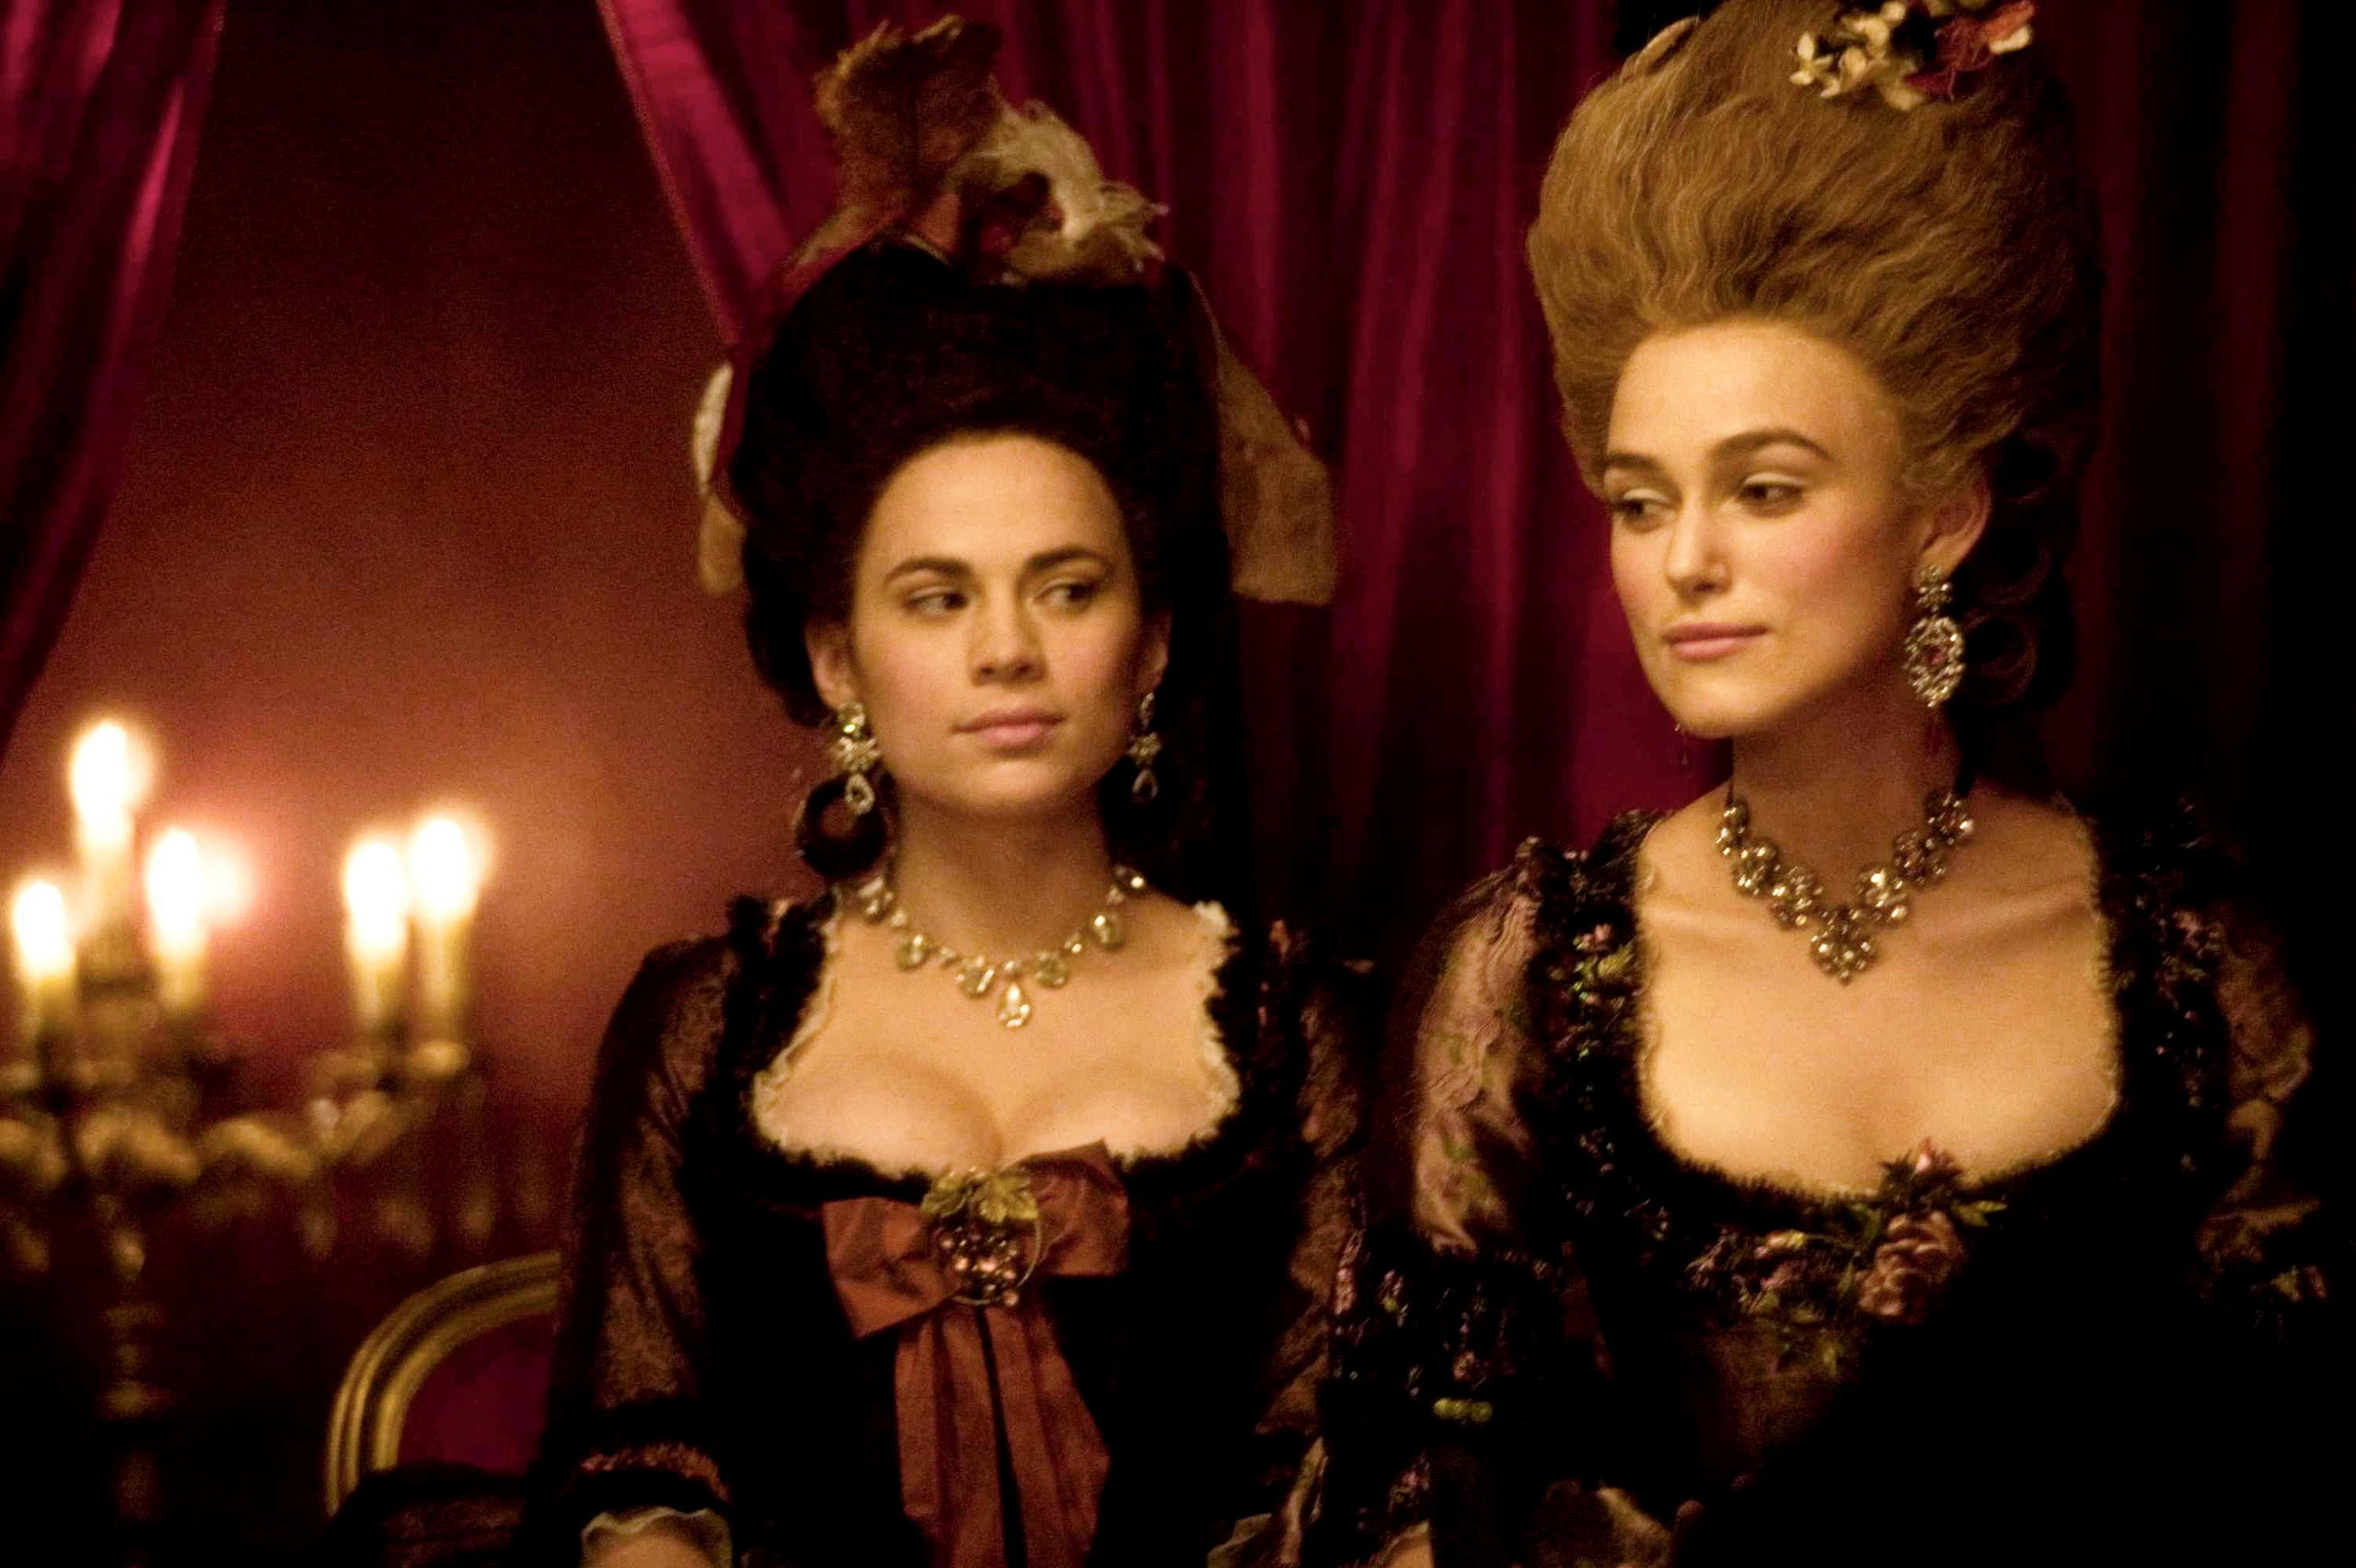 The Duchess - The Duchess Photo (8202342) - Fanpop